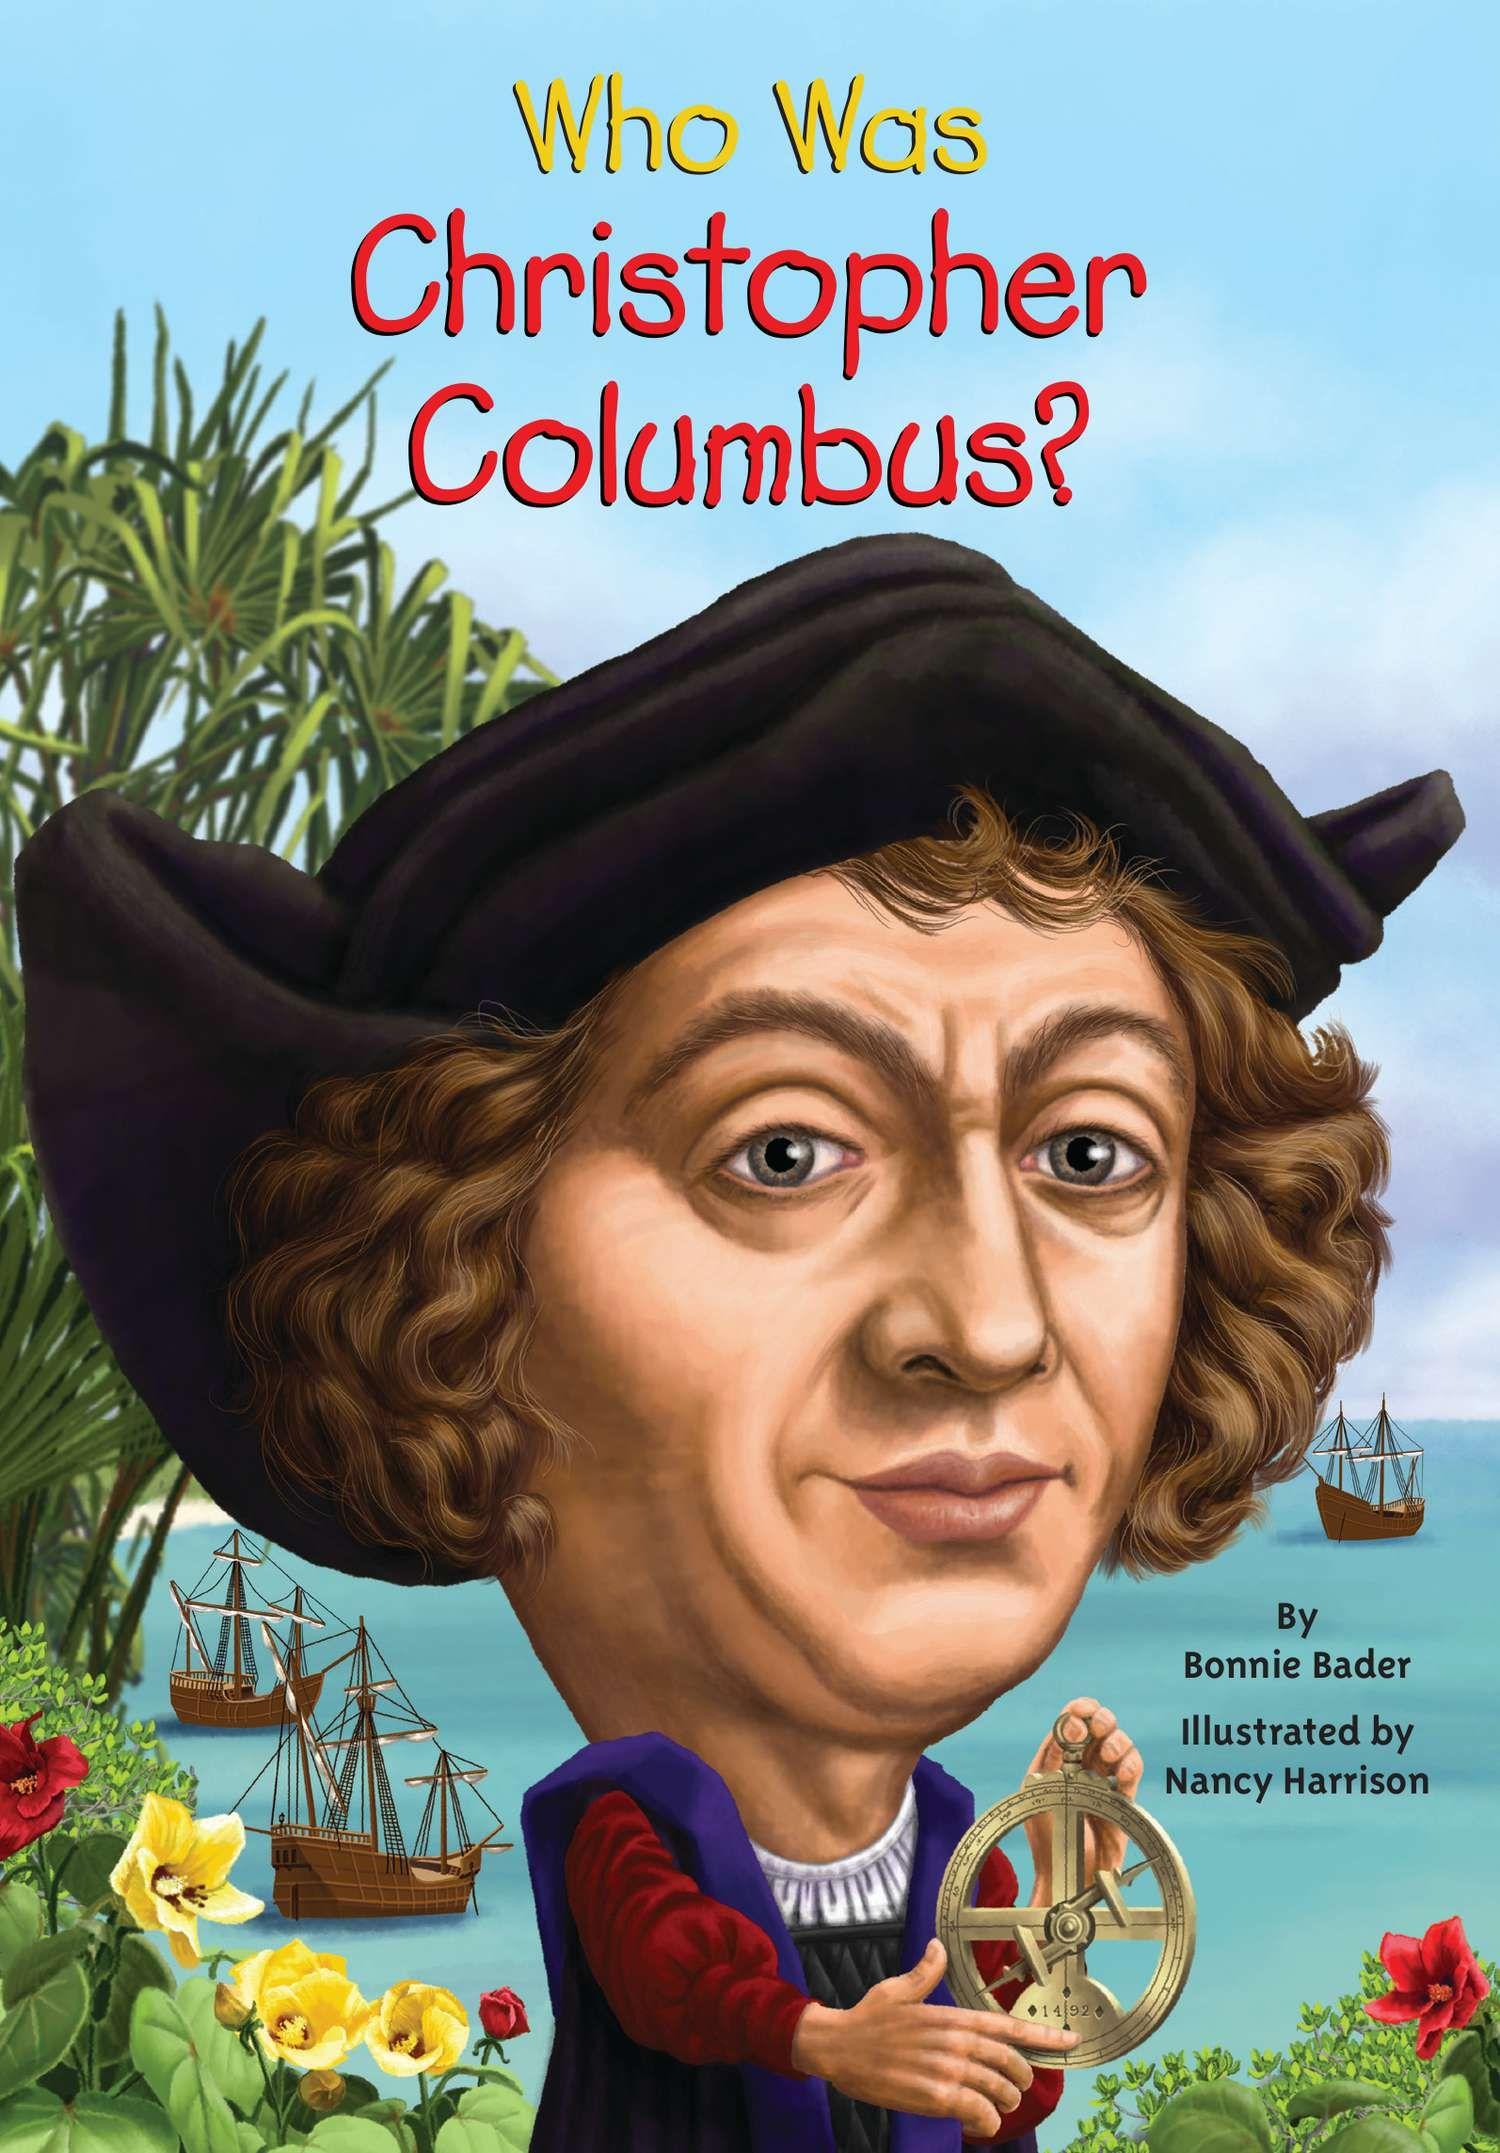 Who Was Christopher Columbus By Bonnie Bader Who Hq 9780448463339 Penguinrandomhouse Com Books Nonfiction Books For Kids Who Was Christopher Columbus Christopher Columbus